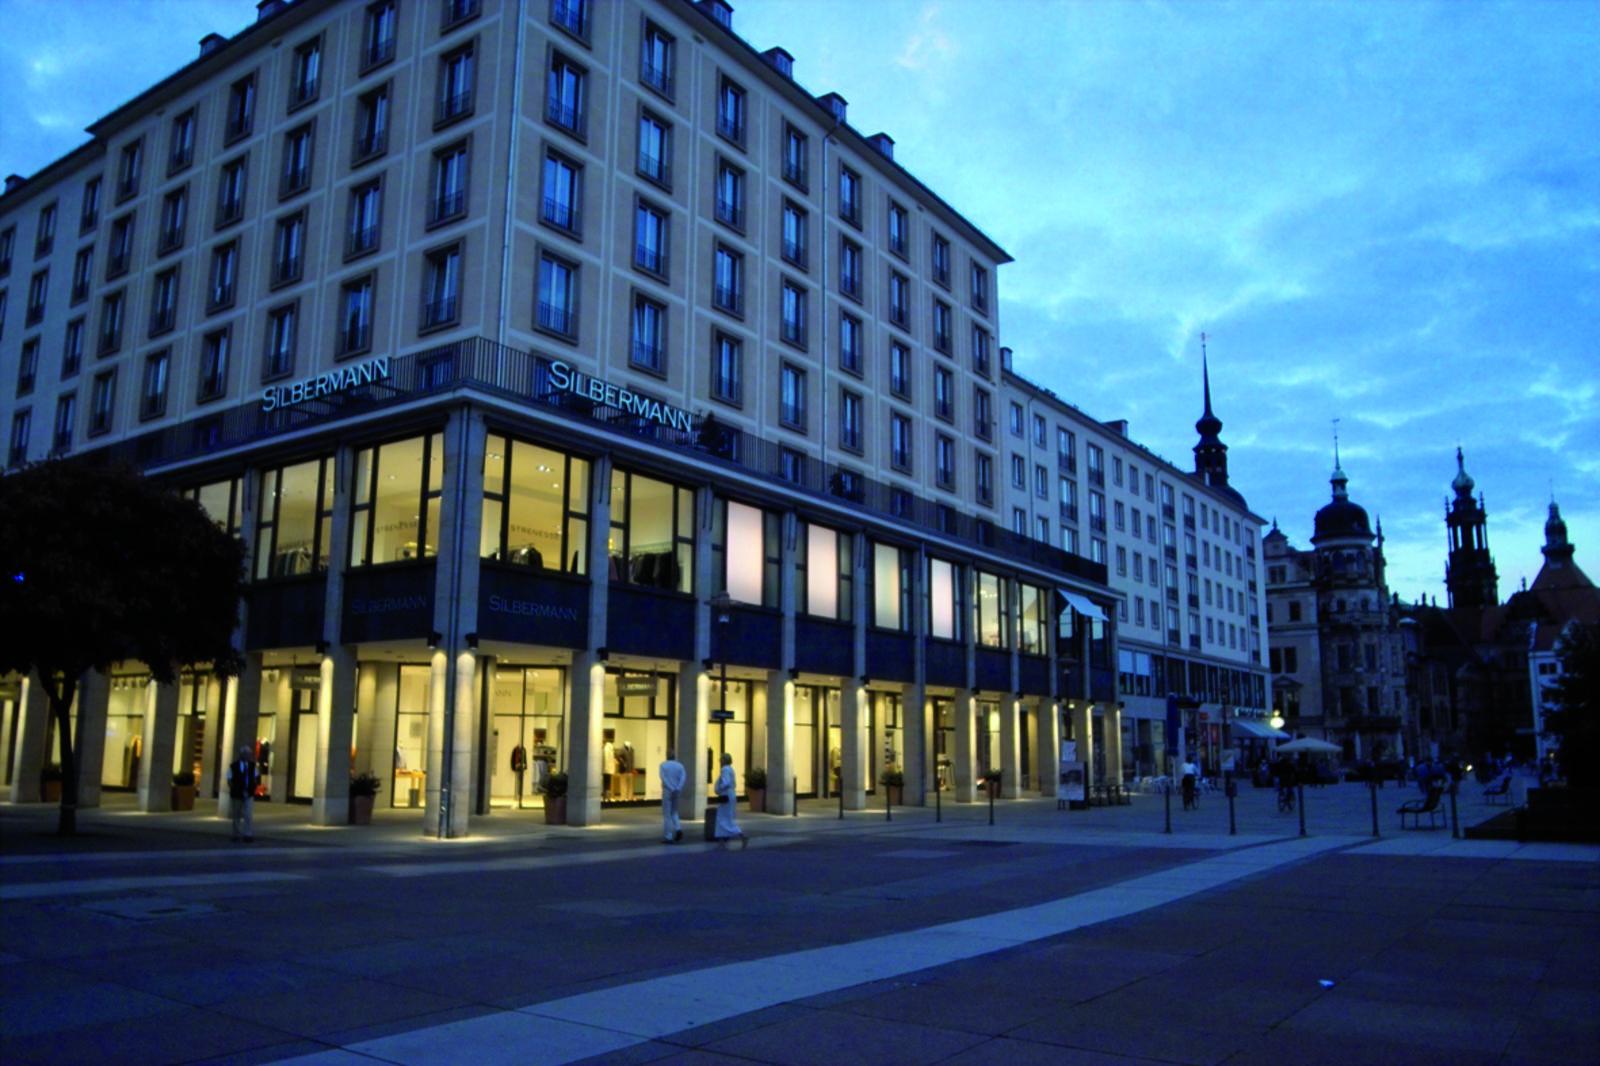 SILBERMANN in Dresden (Bild 3)